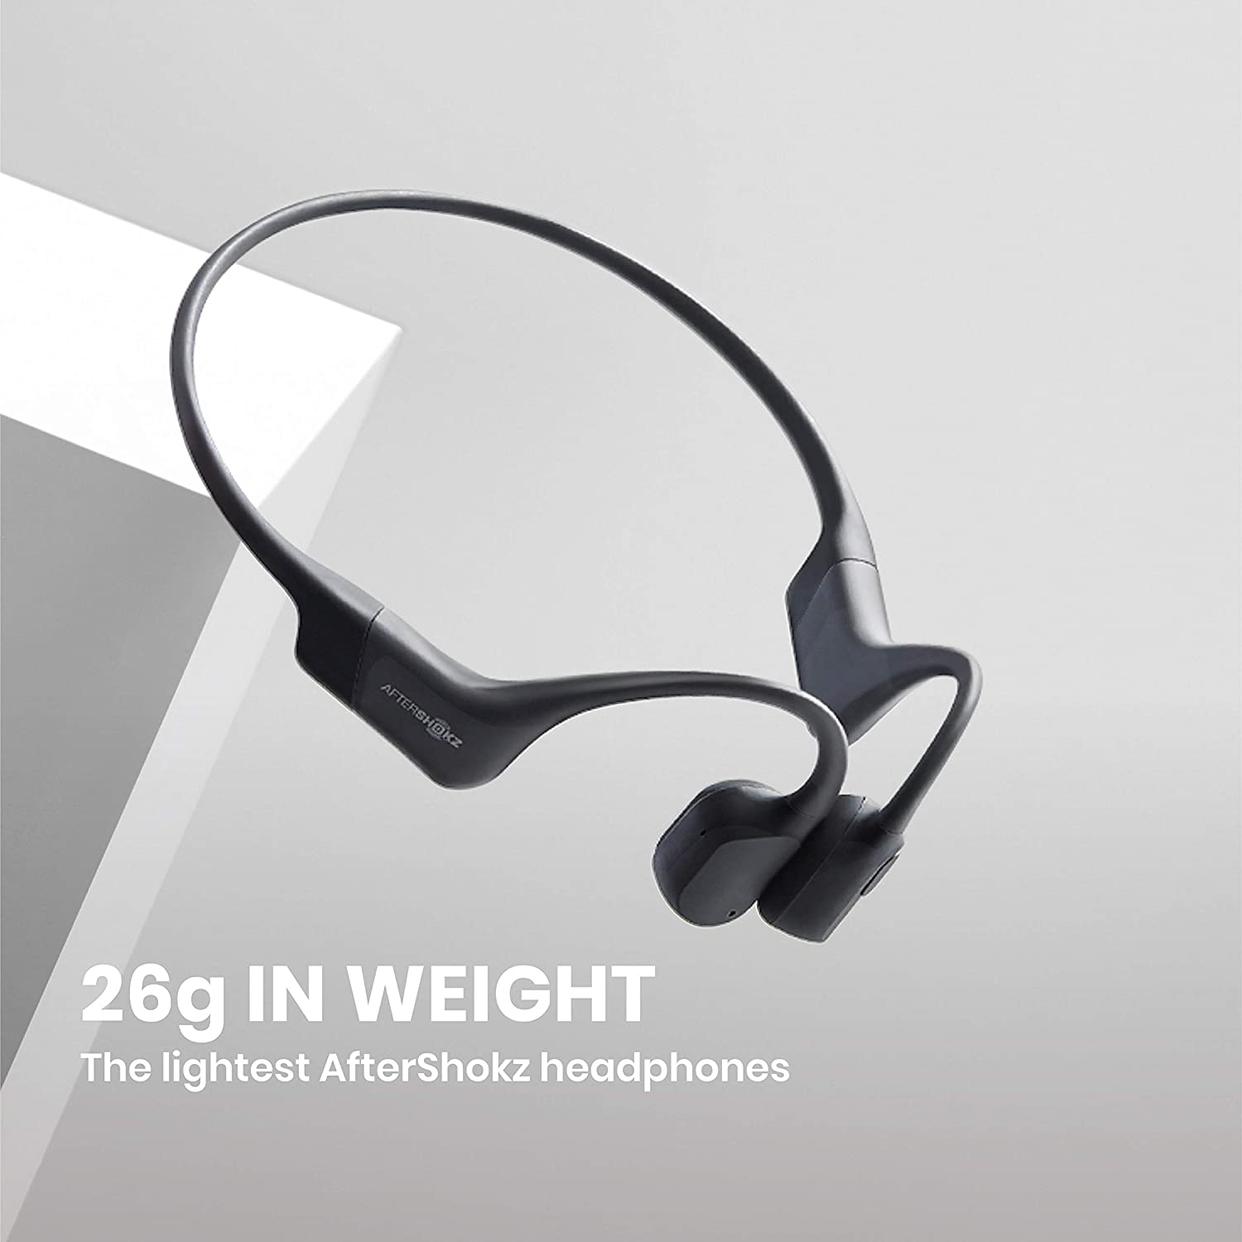 AfterShokz(アフターショックス) 骨伝導ワイヤレスヘッドホン AS800の商品画像6